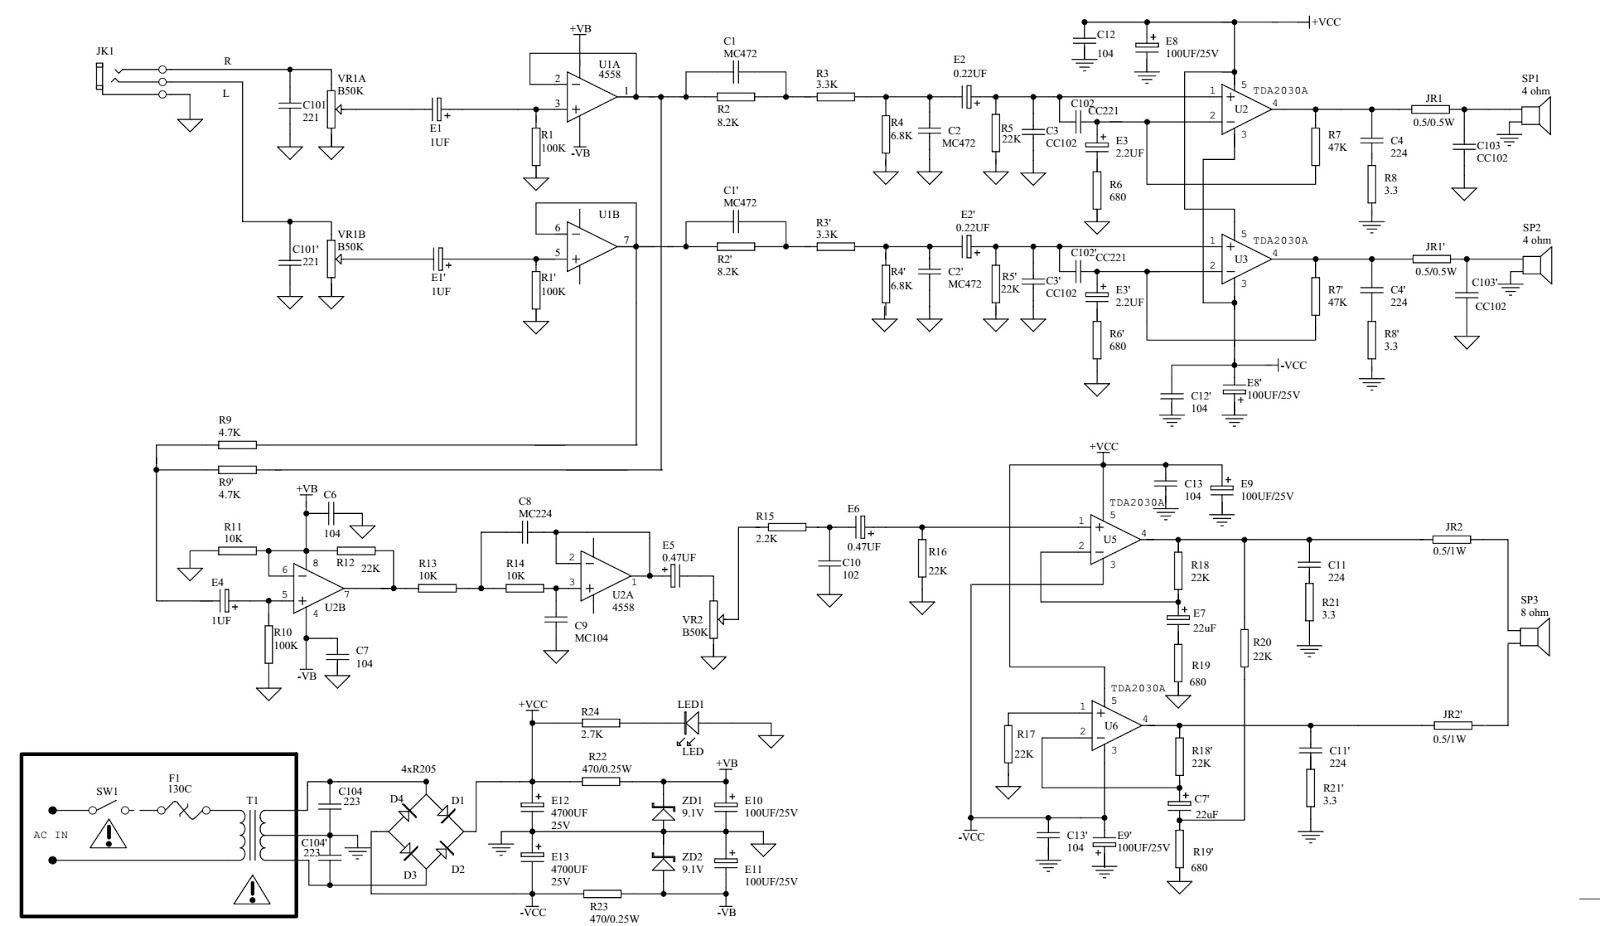 Newyork Gps Tda7377 Subwoofer Circuit Passive Wiring Diagram Micolab A330